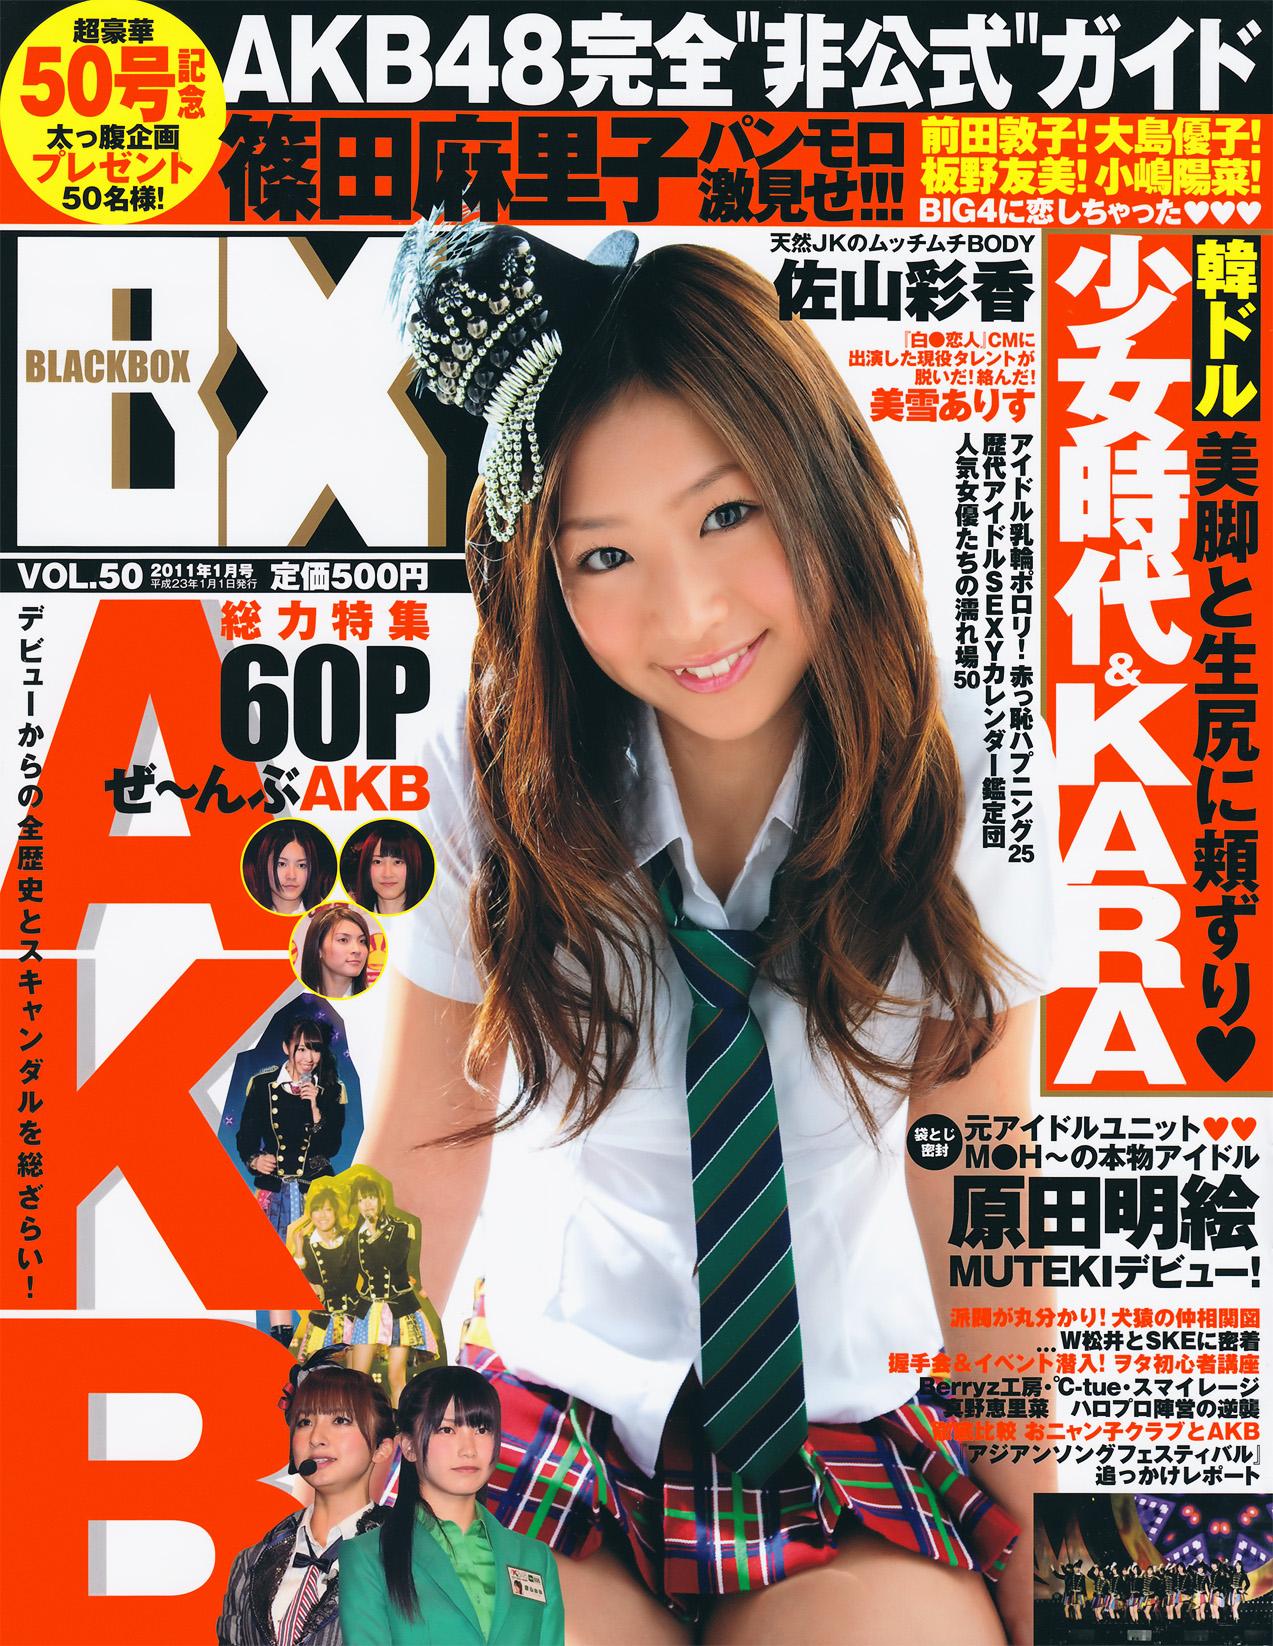 [UPL] [BLACK BOX] 2011.01 佐山彩香 小泉麻耶 松本さゆき 村上友梨 立花麗美 森はるか